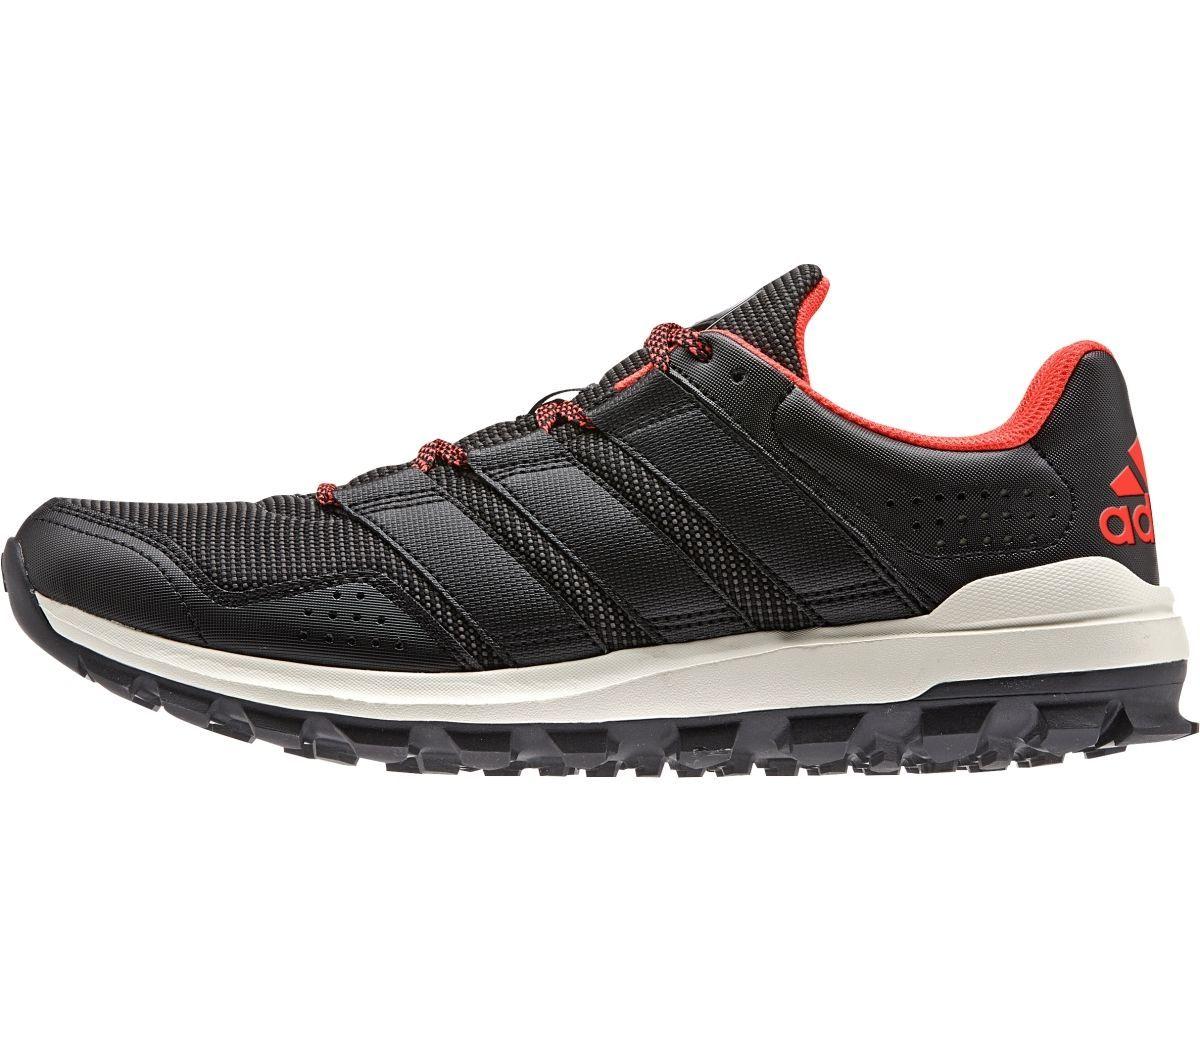 Adidas Mens Slingshot OUTDOOR TRAIL SHOES B23254 reg: $ 75